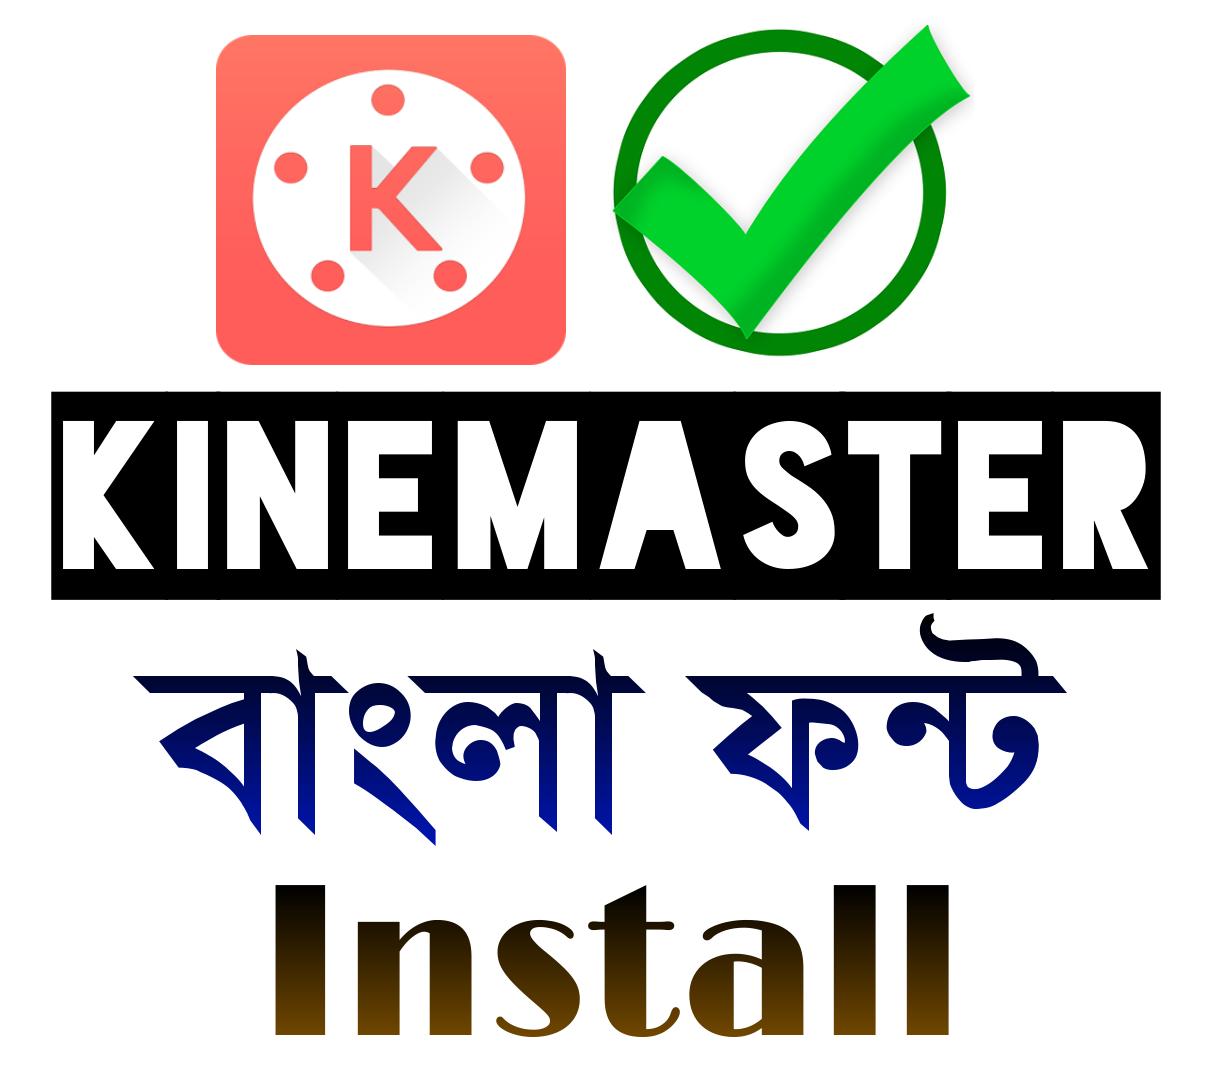 [1st On Net] KineMaster-এ বাংলা ফন্ট Install করুন, আর চরম স্টাইলে ভিডিও এডিট করুন!!!!